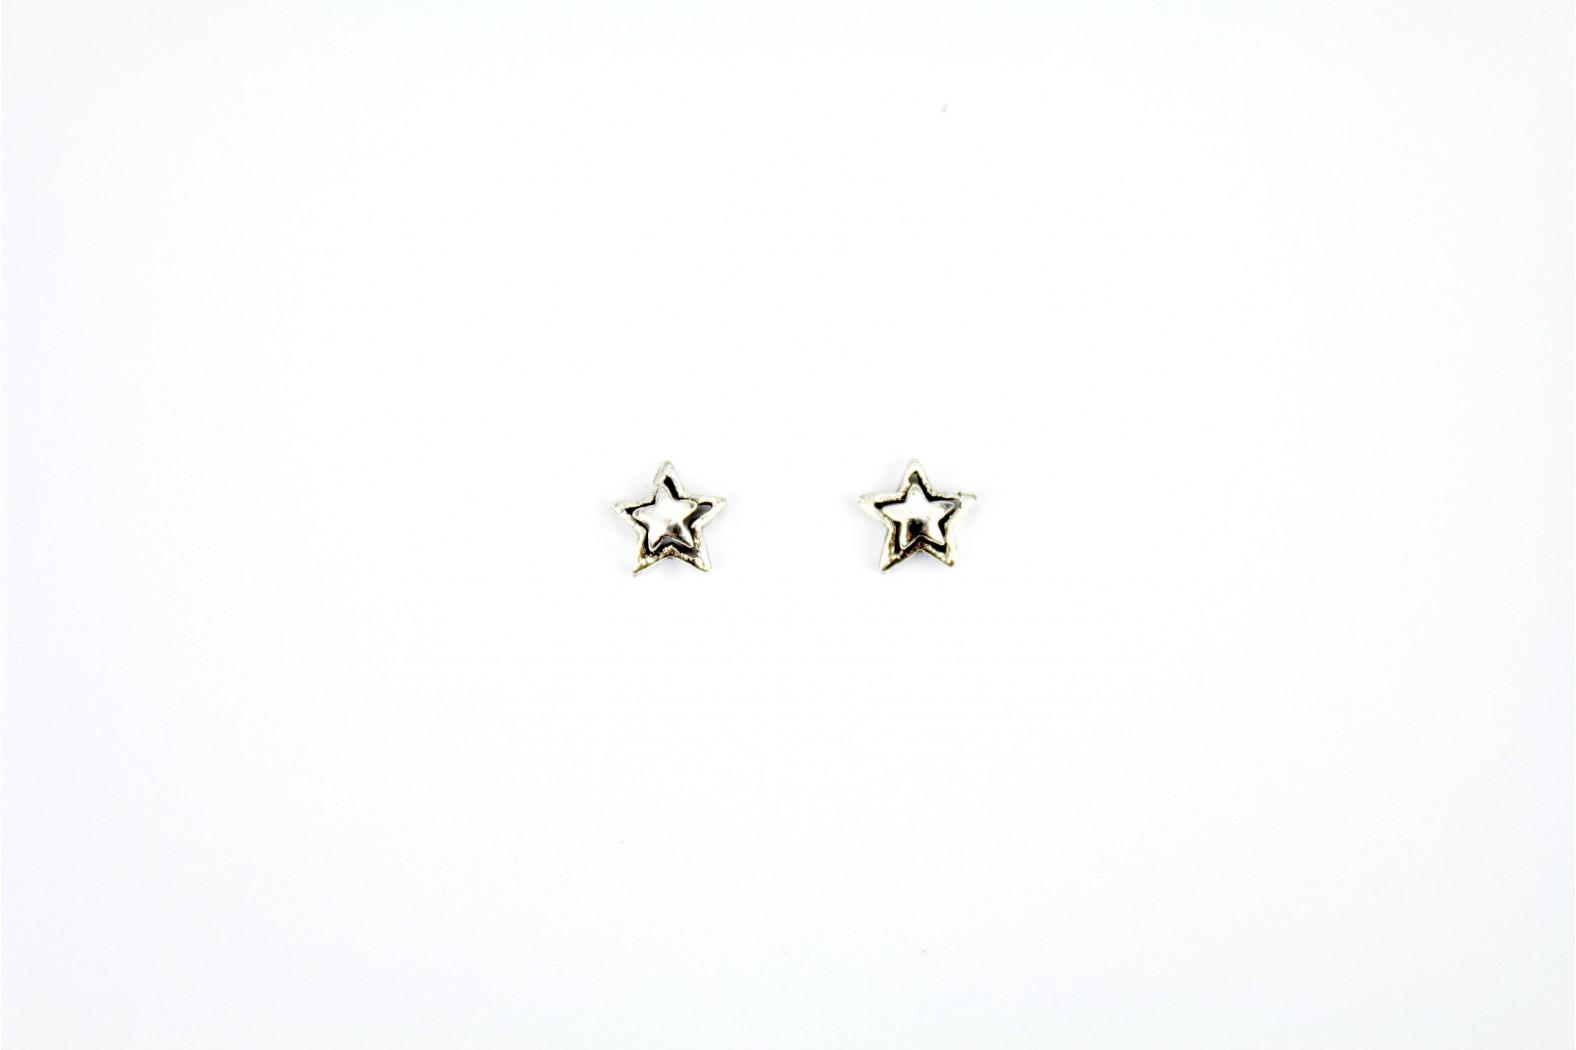 Star Mounted on Star silver stud earrings